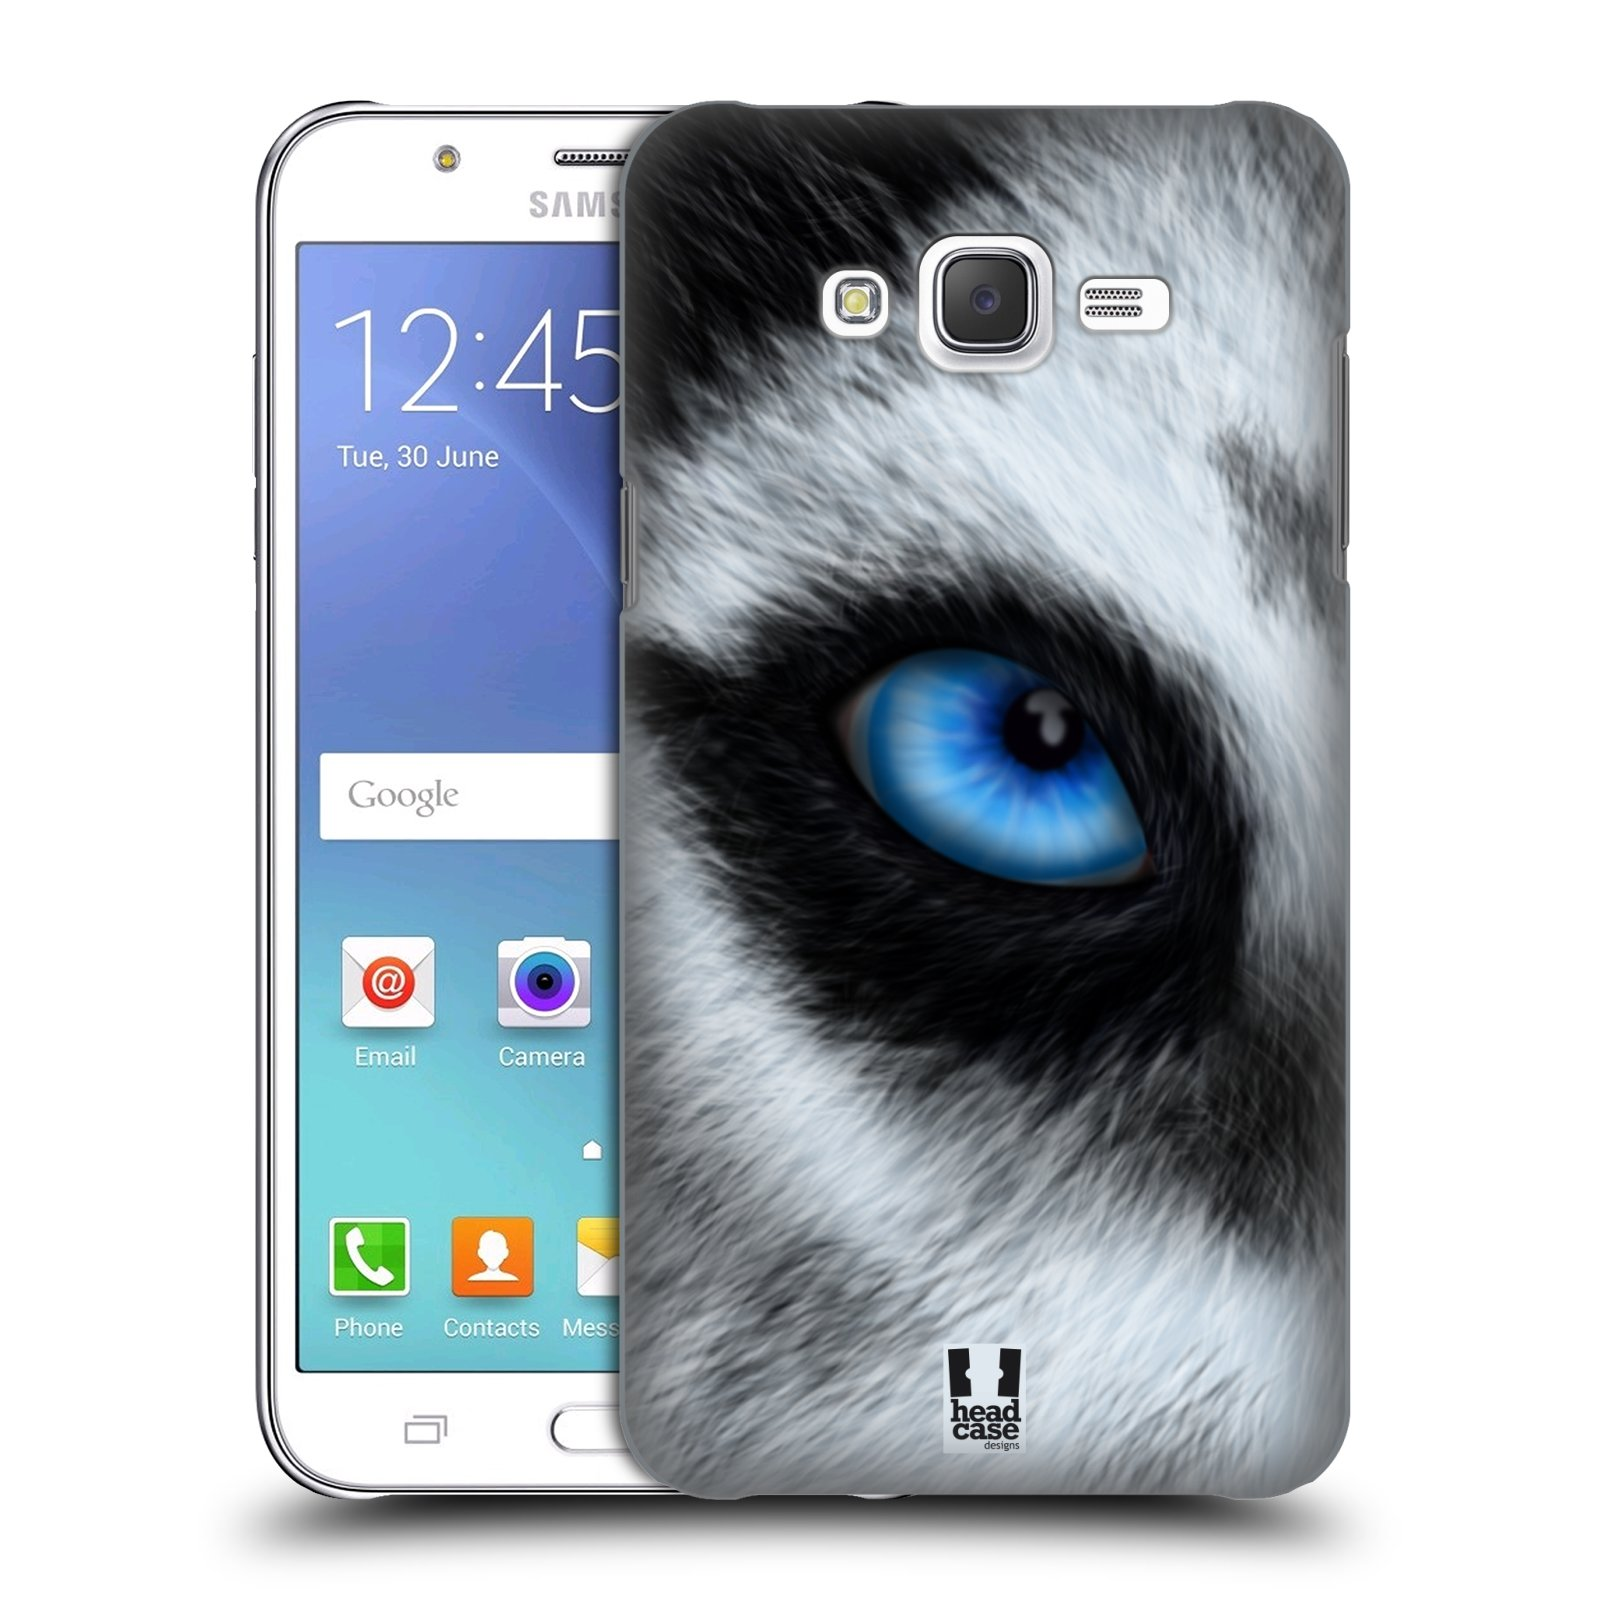 HEAD CASE plastový obal na mobil SAMSUNG Galaxy J7, J700 vzor pohled zvířete oko pes husky